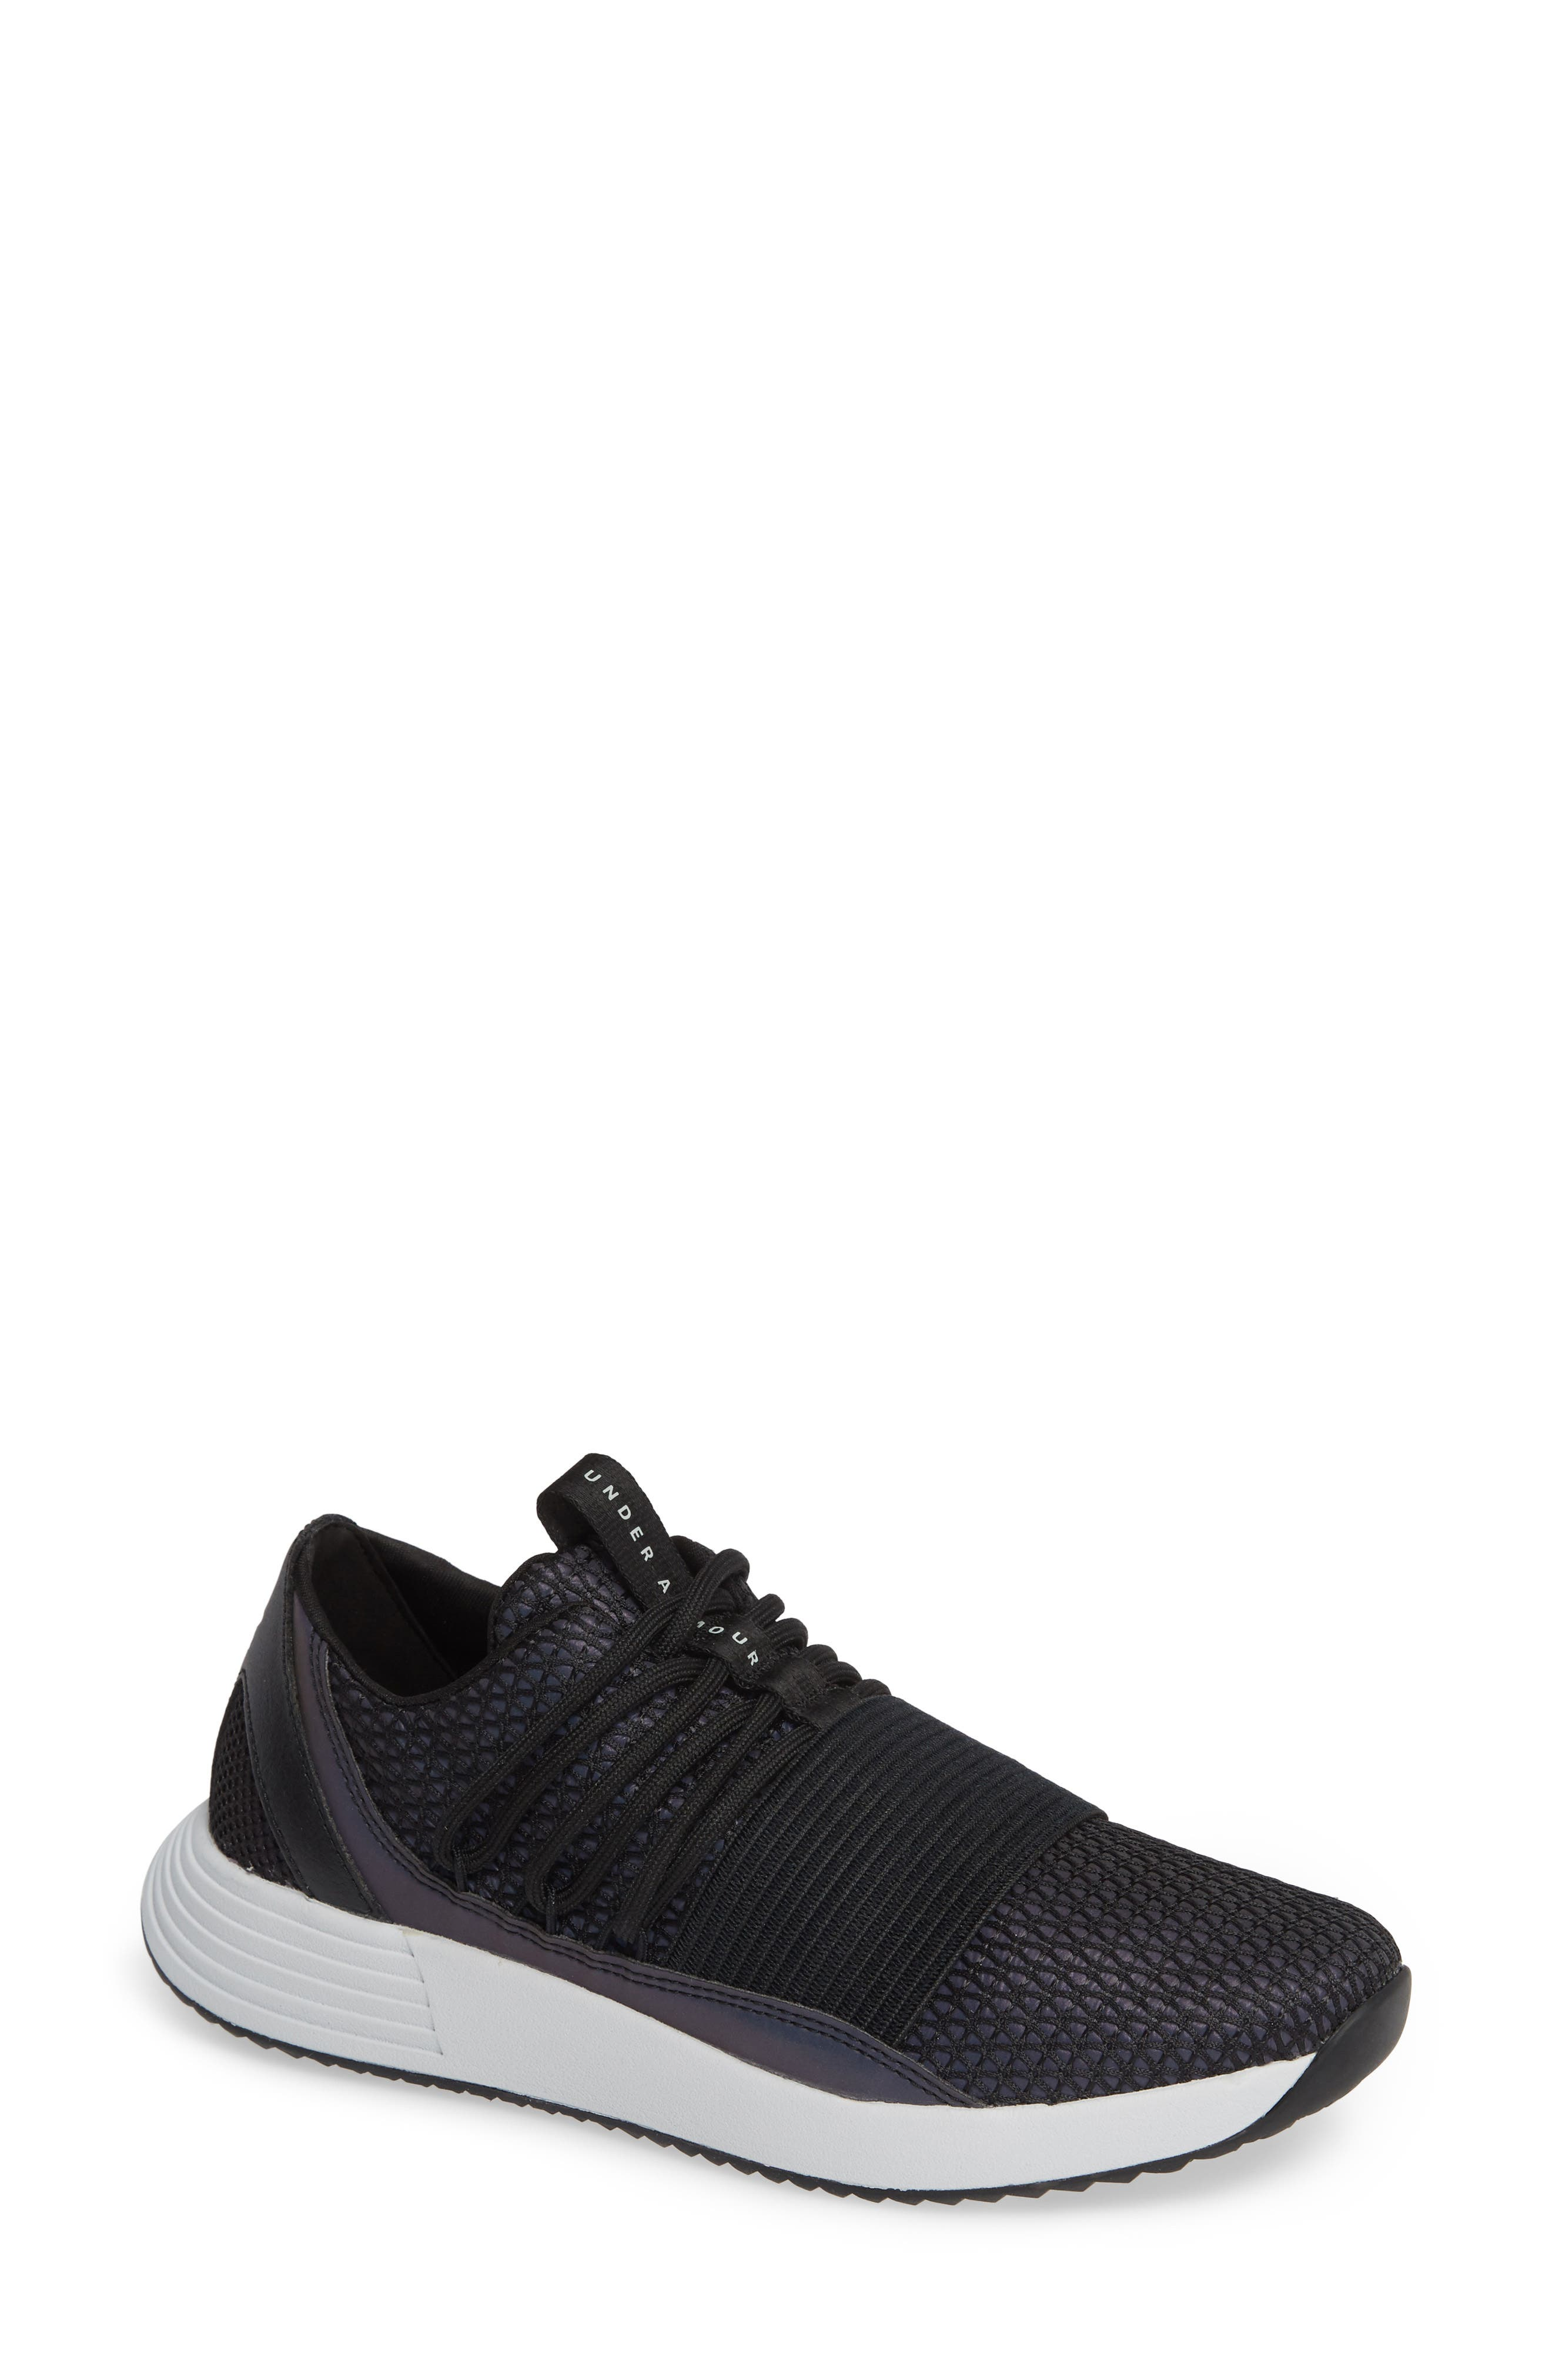 Breathe Reflective Low Top Sneaker,                             Main thumbnail 1, color,                             BLACK/ BLACK/ BLACK